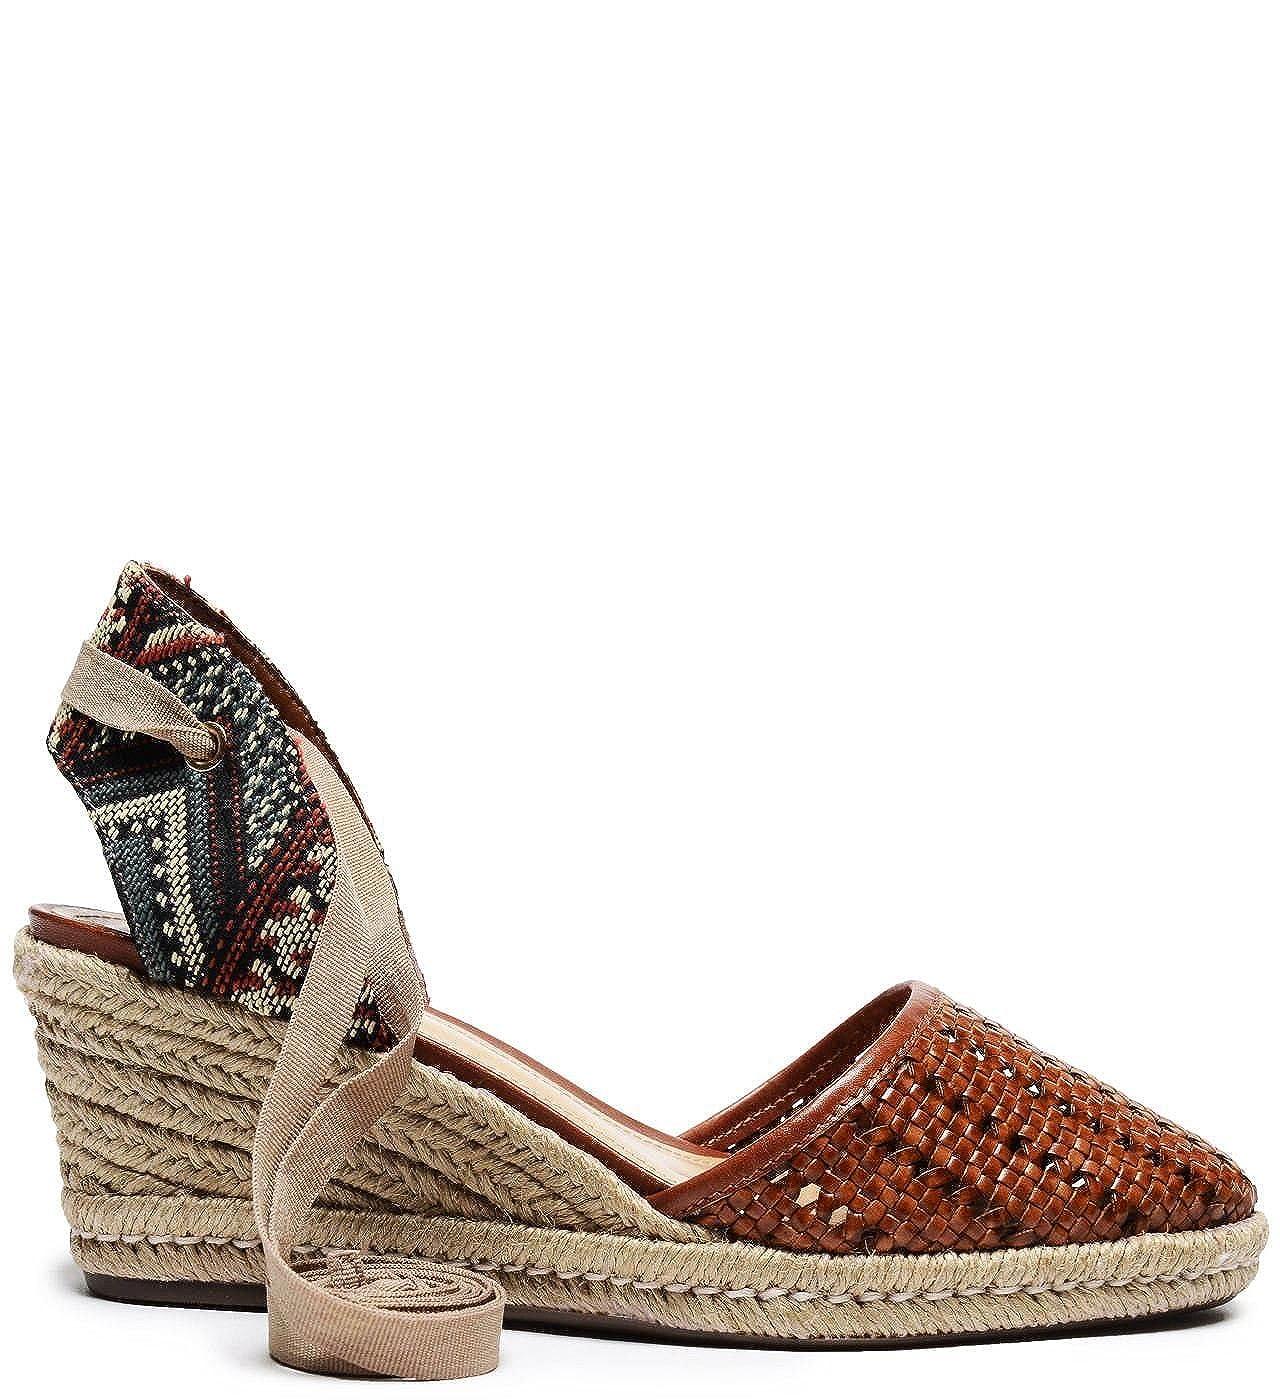 SCHUTZ Dieniffer Caramel Woven Leather Espadrille Mid Wedge Tie Up Sandal